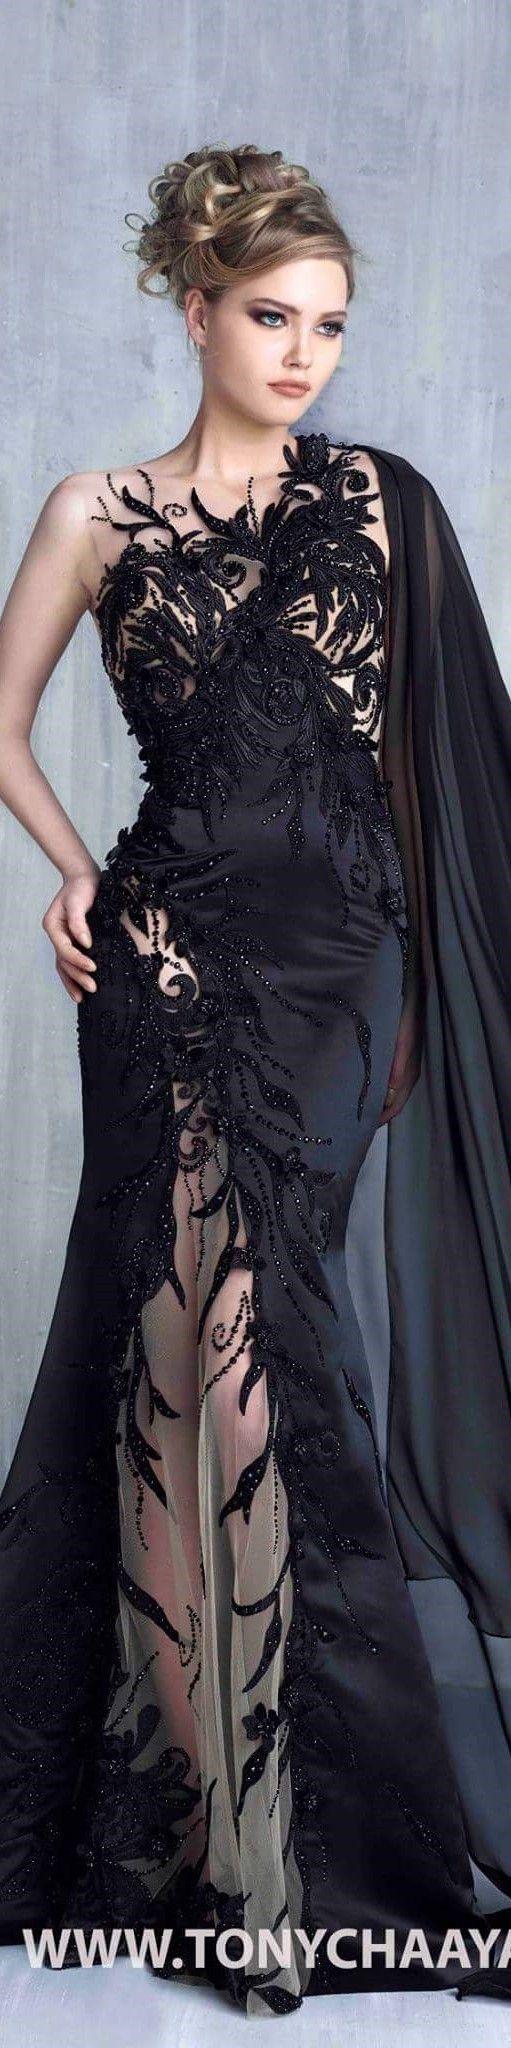 Tony Chaaya couture 2016 ❤️